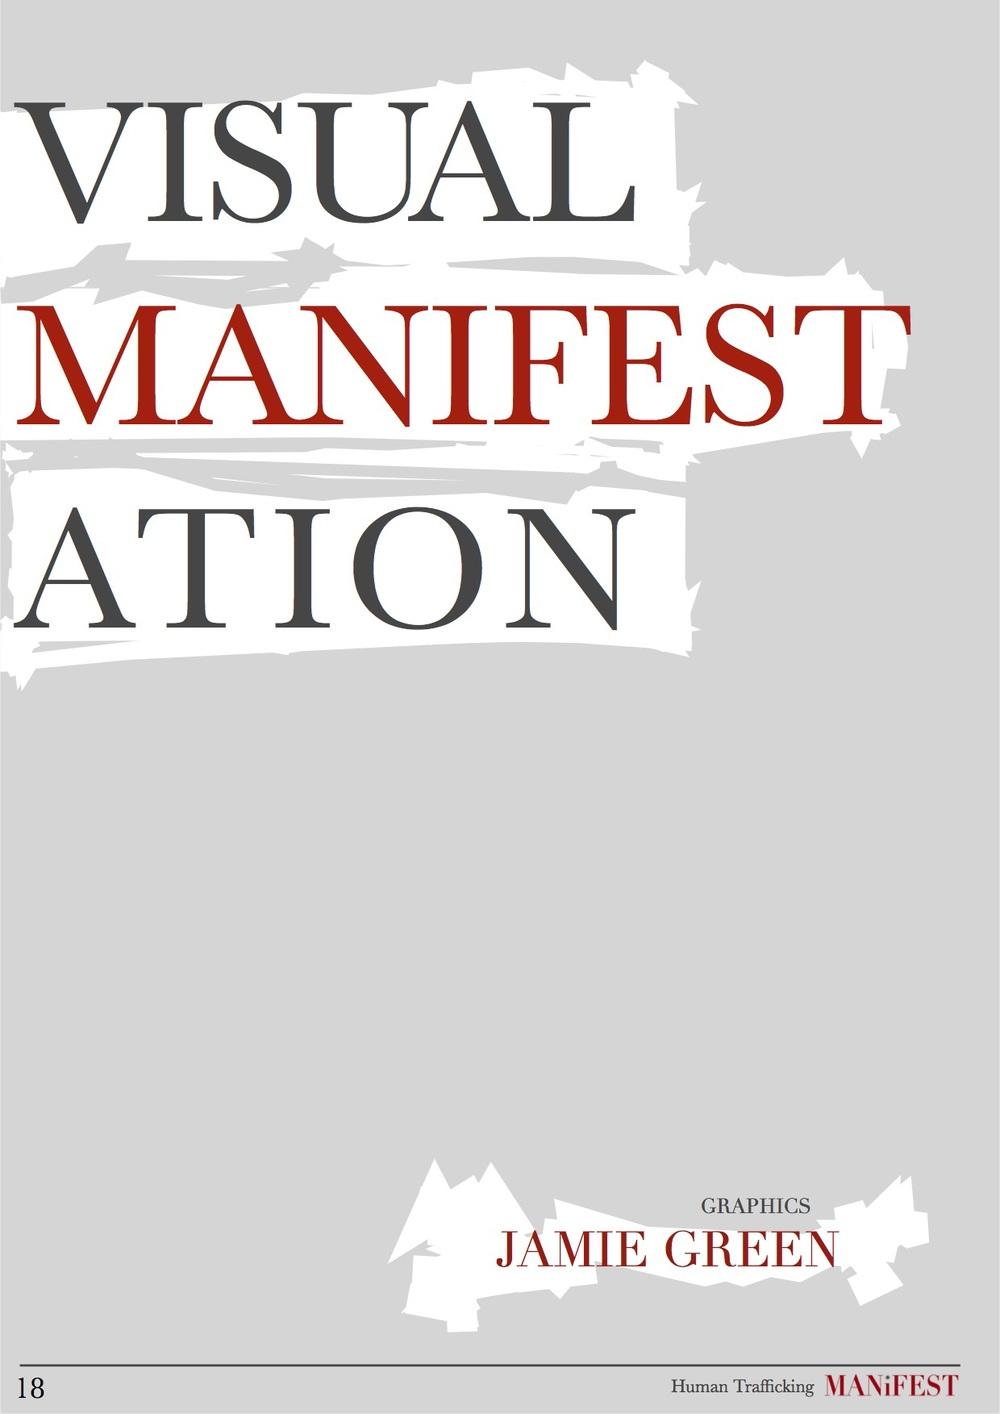 Manifest22222222222222.jpg